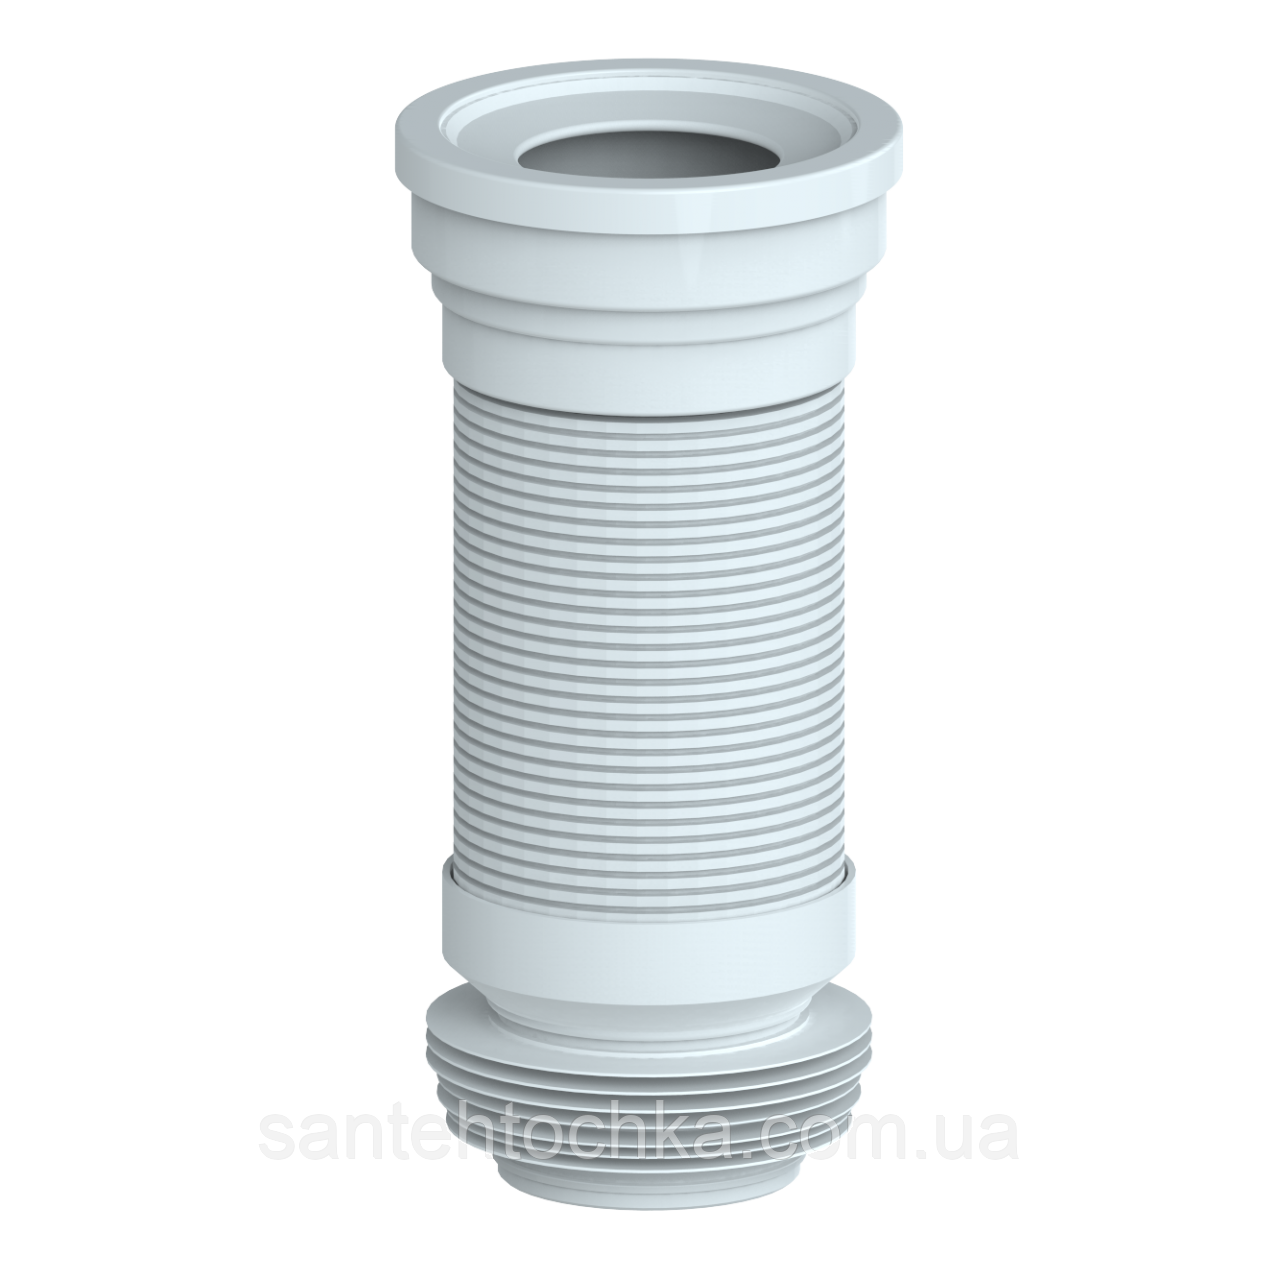 Гофро-труба для унитаза армированная 350мм UNICORN 42шт